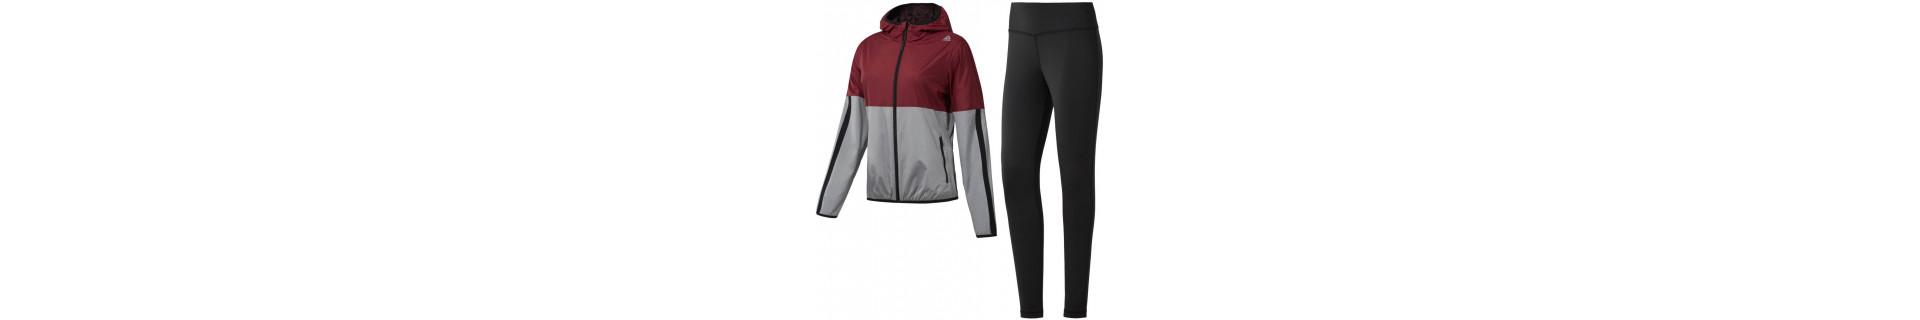 Chandal para mujer Adidas, Nike, Puma, Reebok